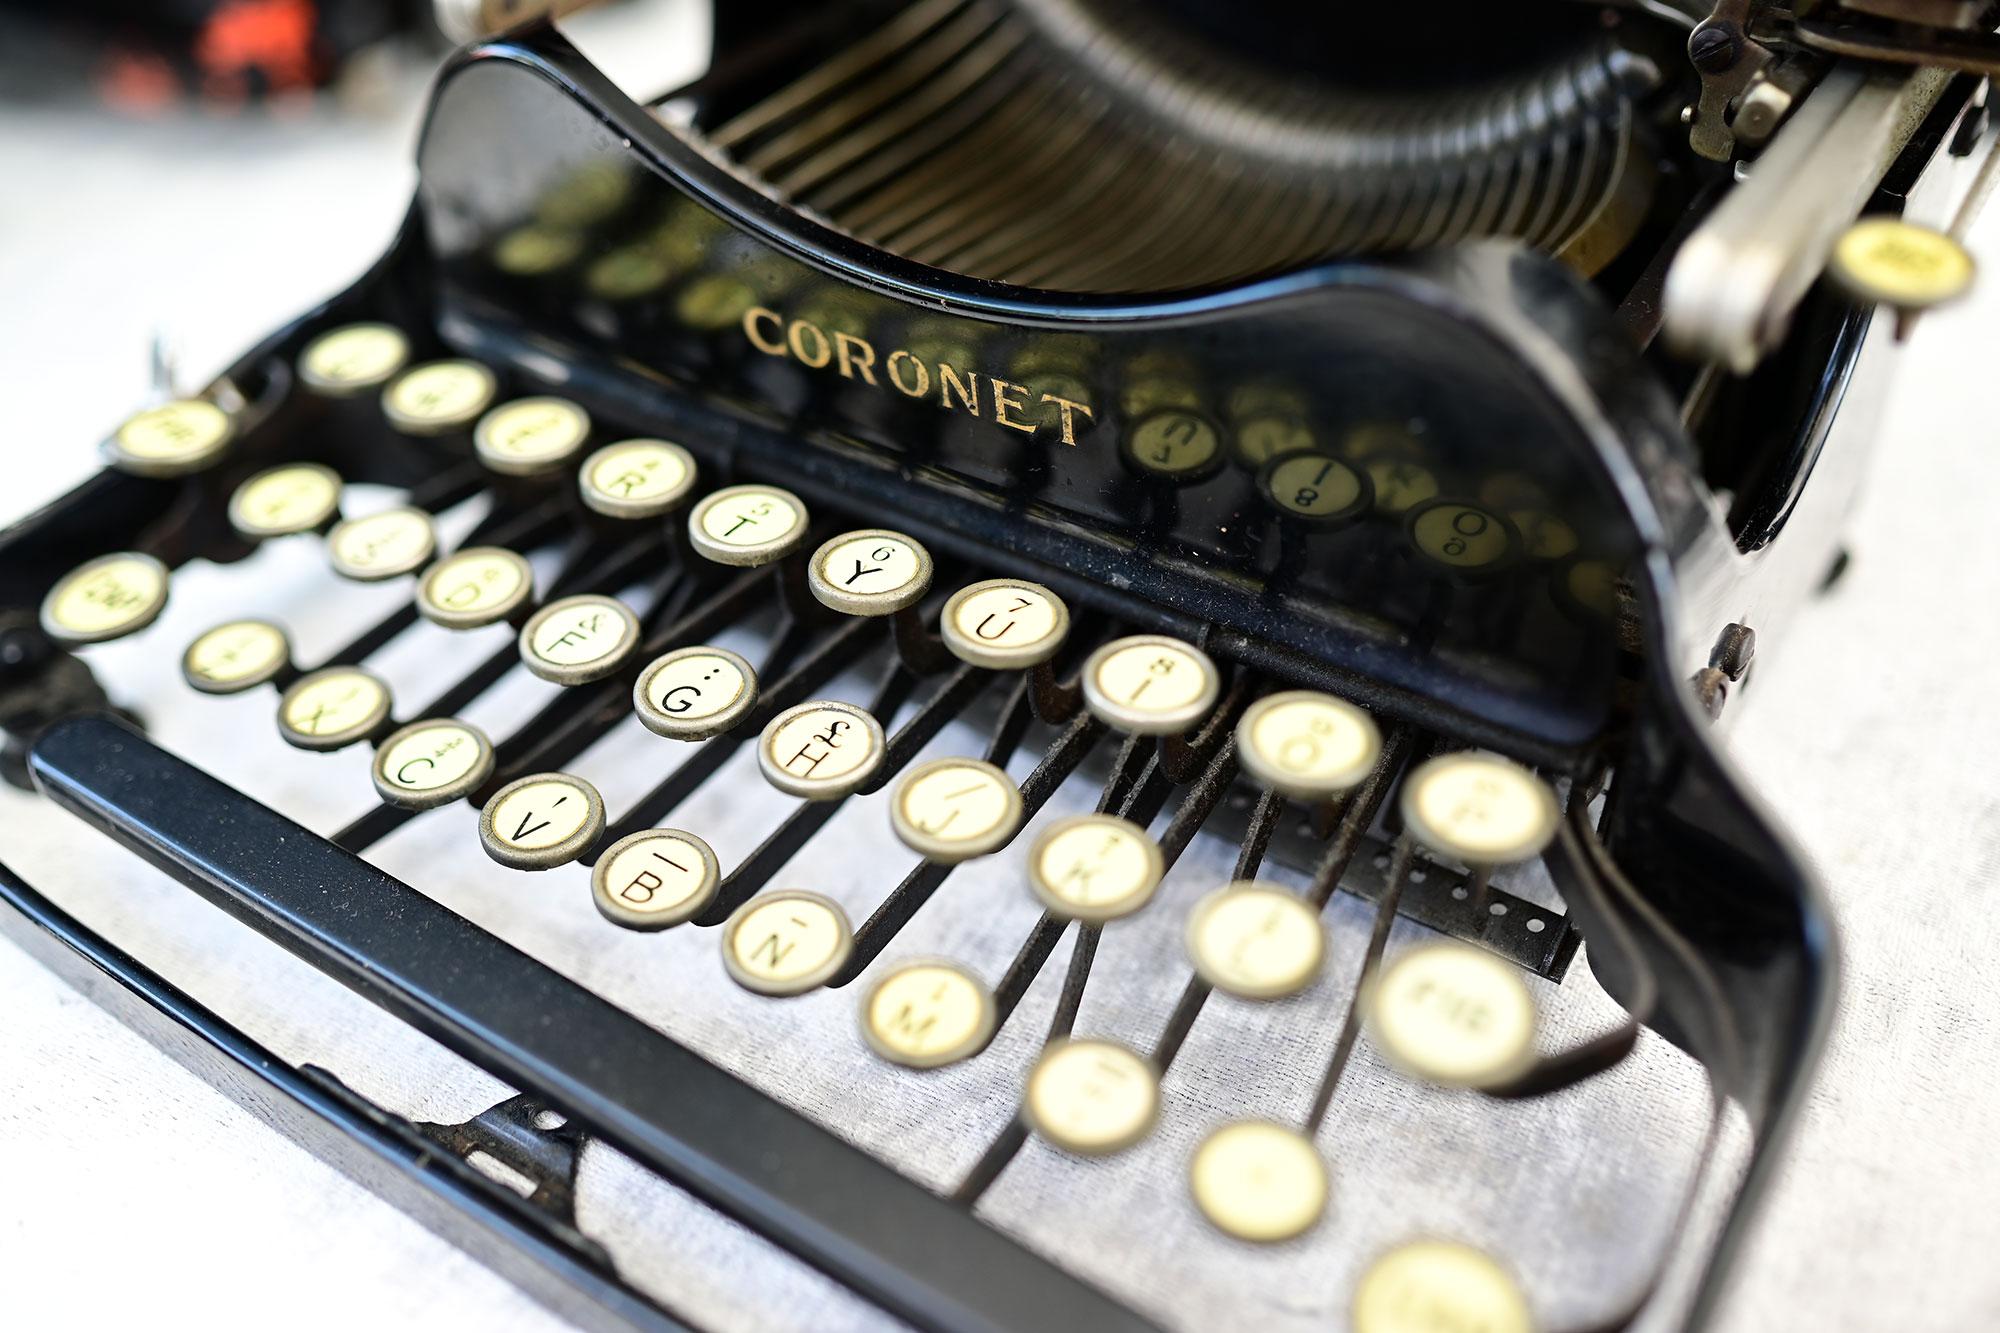 macchina da scrivere coronet